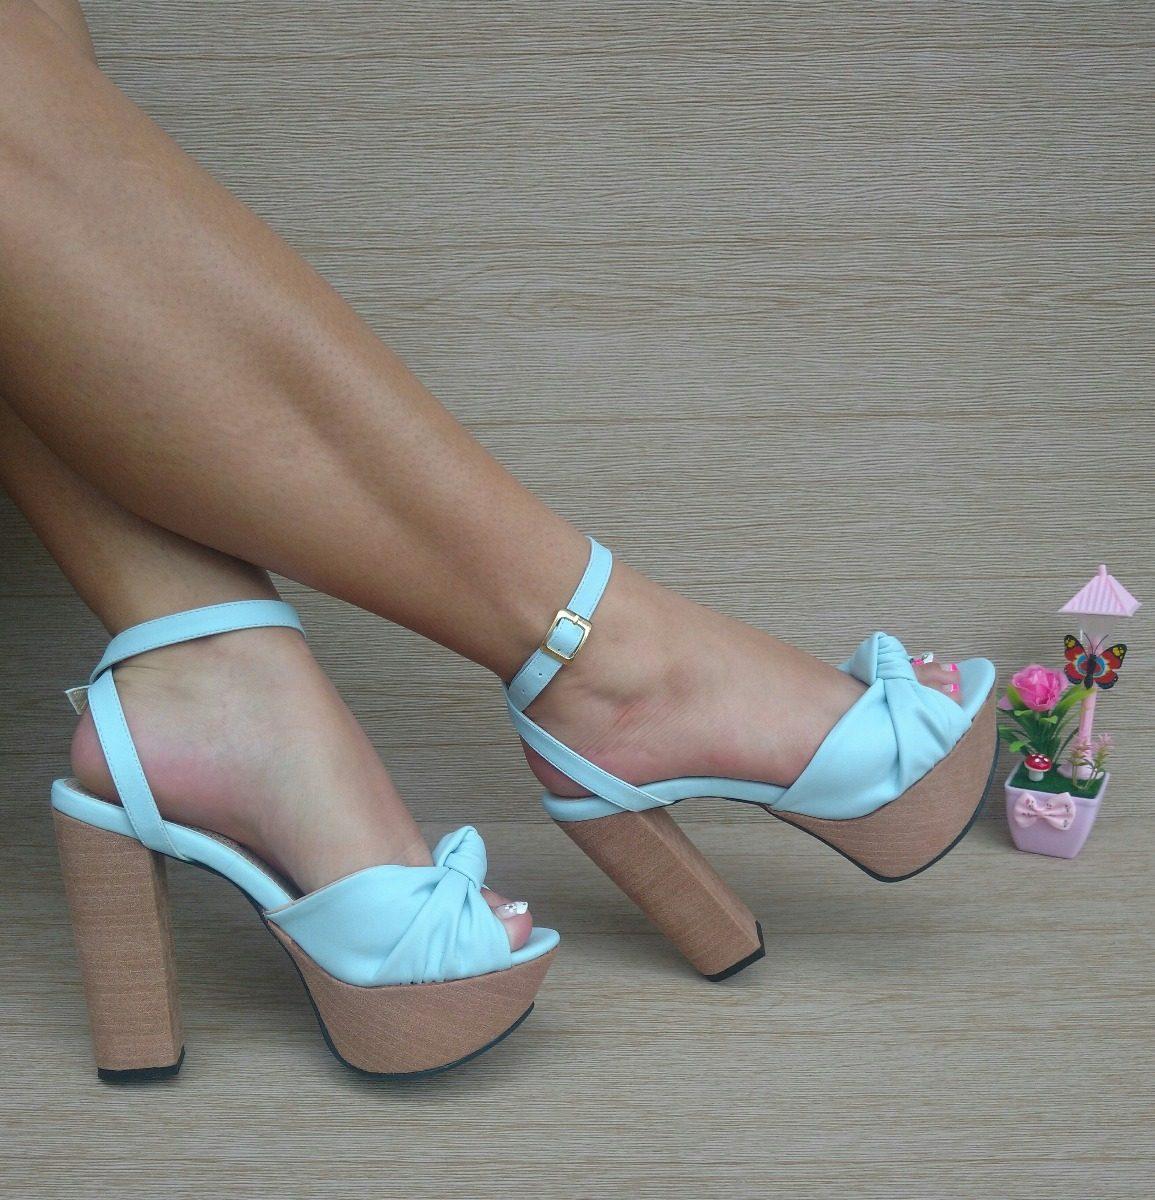 Calzado Alto De Azul Moda Elegancia Moño Tacon Color Mujeres nO0wPk